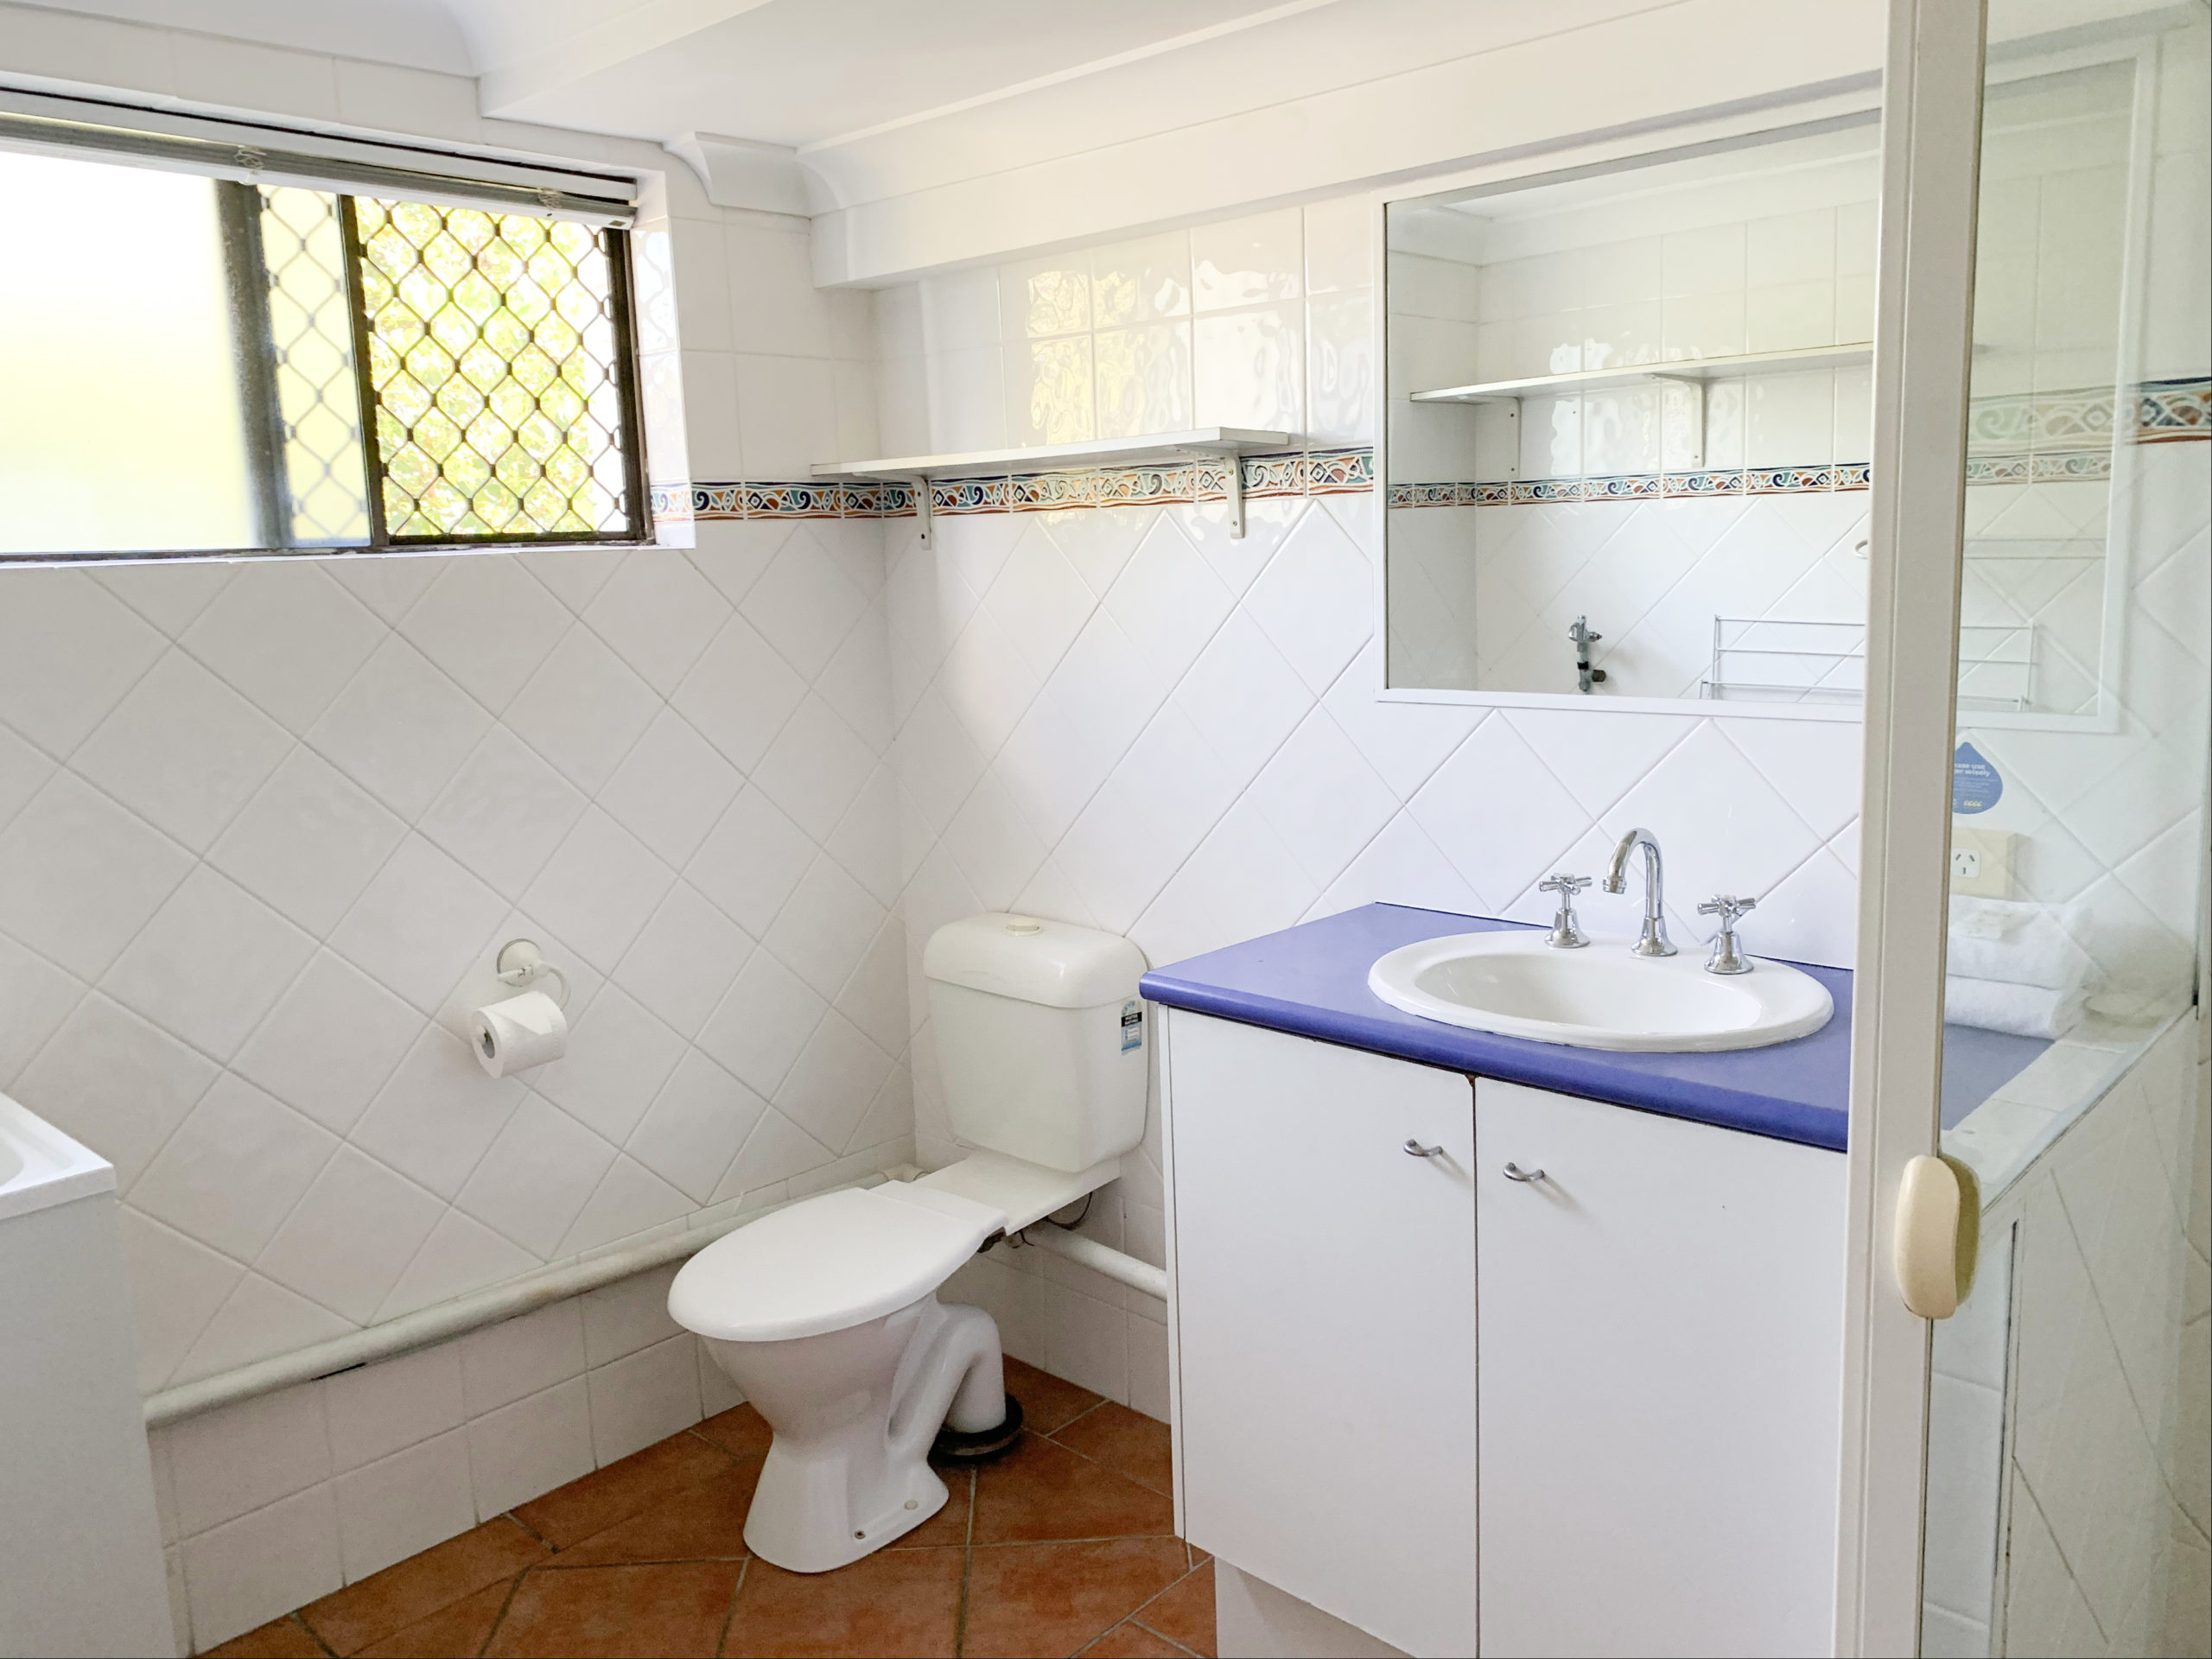 harbourside-resort-gold-coast-one-bedroom-apartment-bathroom